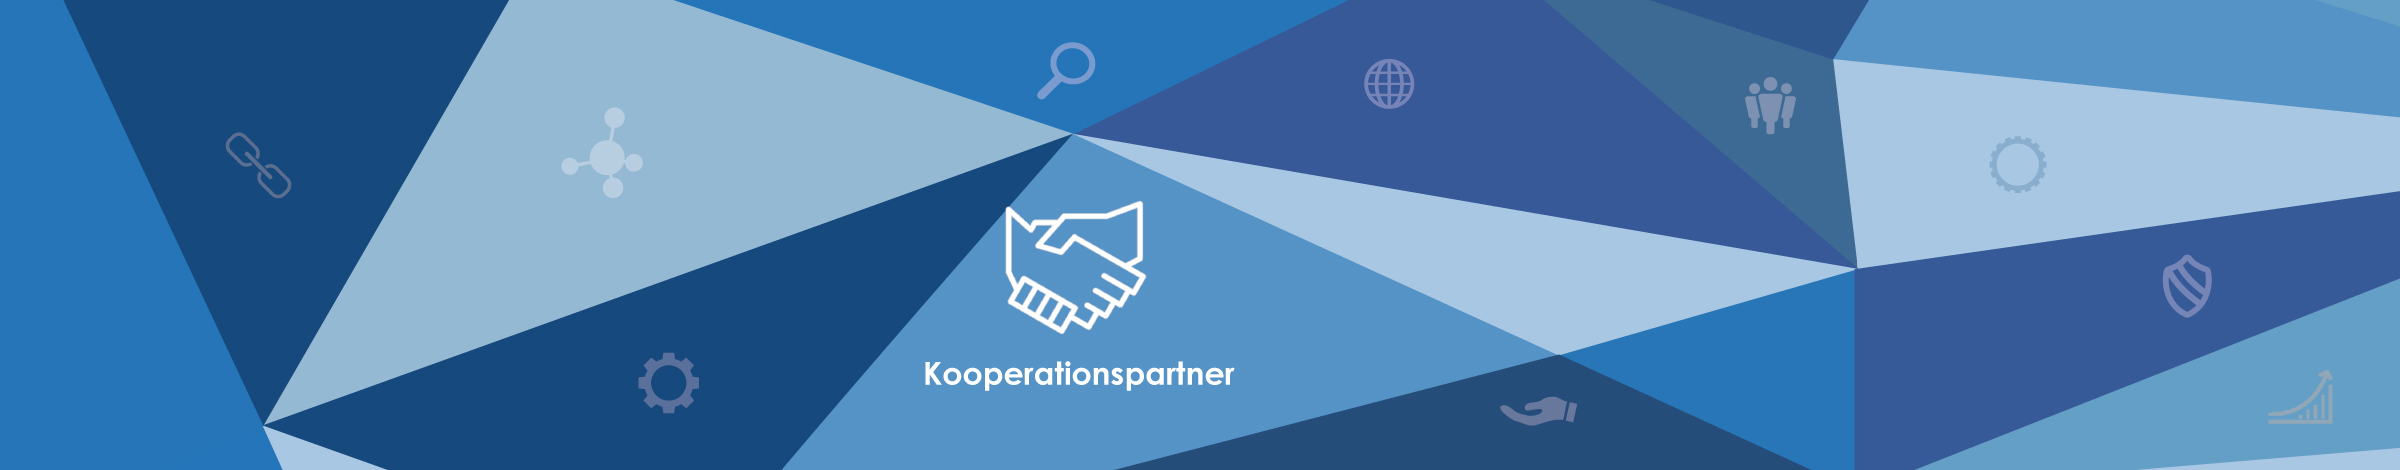 web updates kmu GmbH-wuk-WordPress und SEO Agentur - Bild kooperationspartner partner